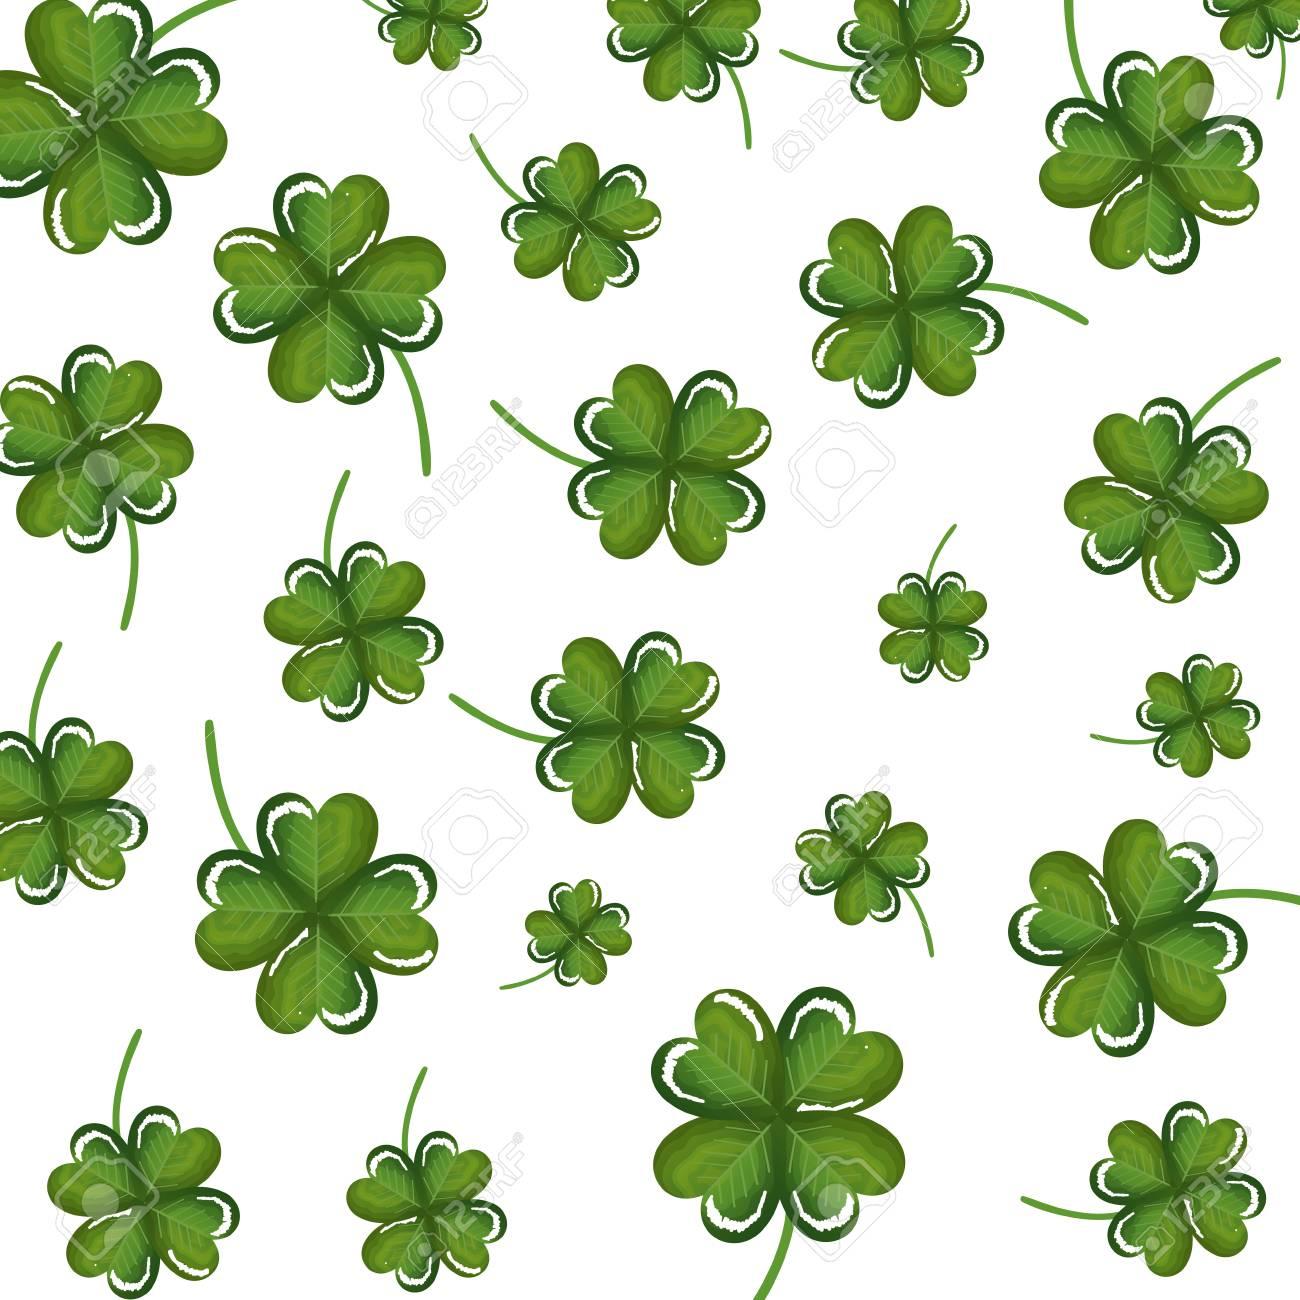 clovers leafs pattern background vector illustration design - 126775241